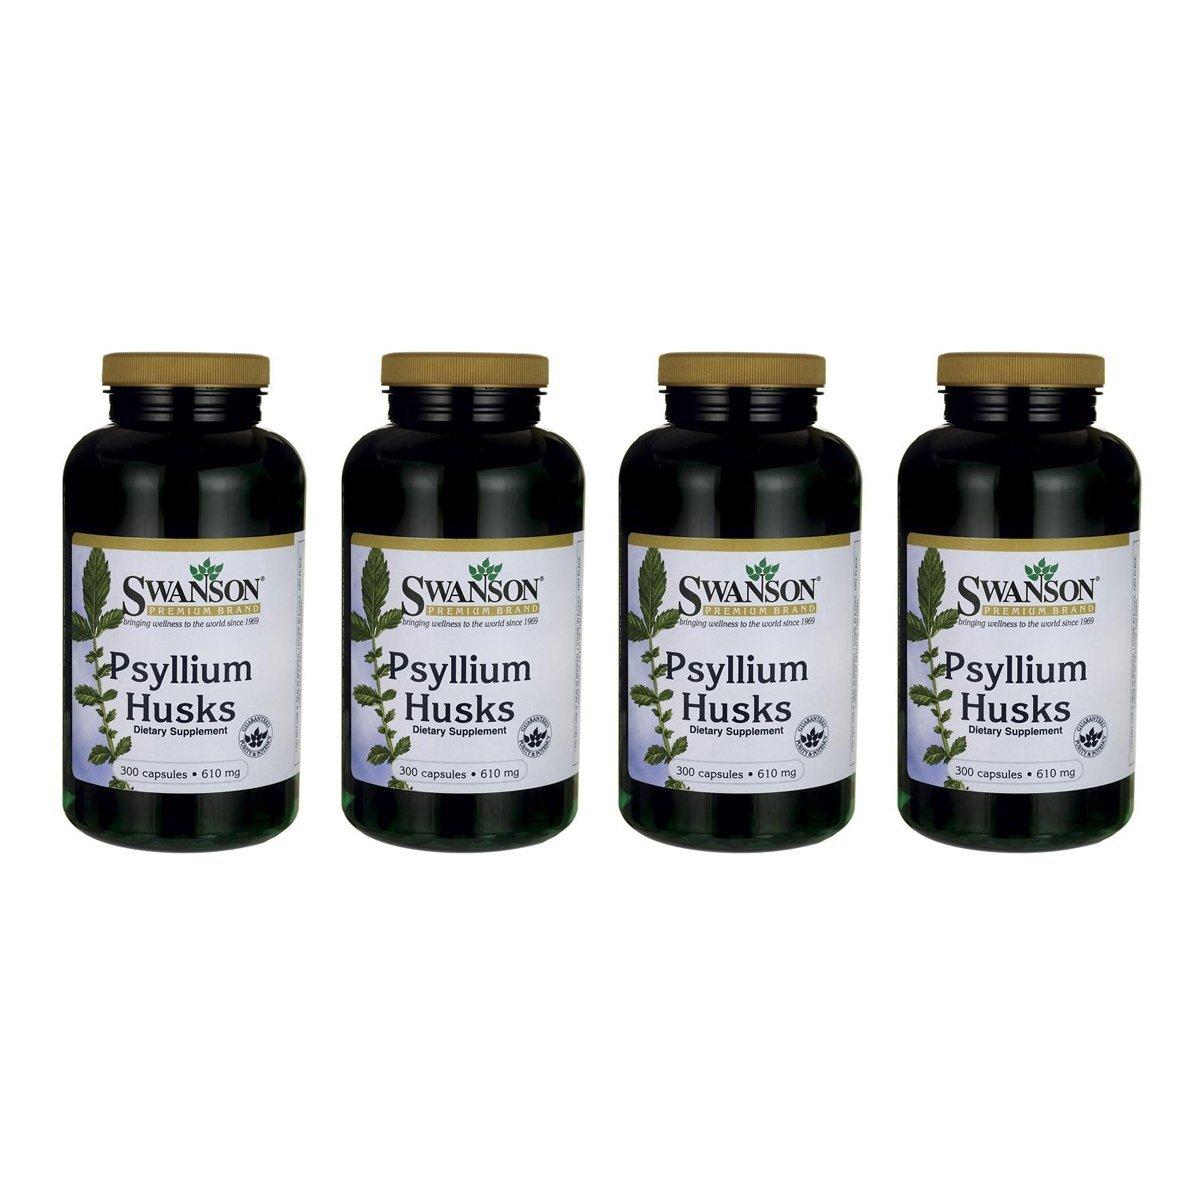 Swanson Psyllium Husk Digestive Weight Colon Health Dietary Fiber Supplement 610 mg 300 Capsules (Caps) (4 Pack)